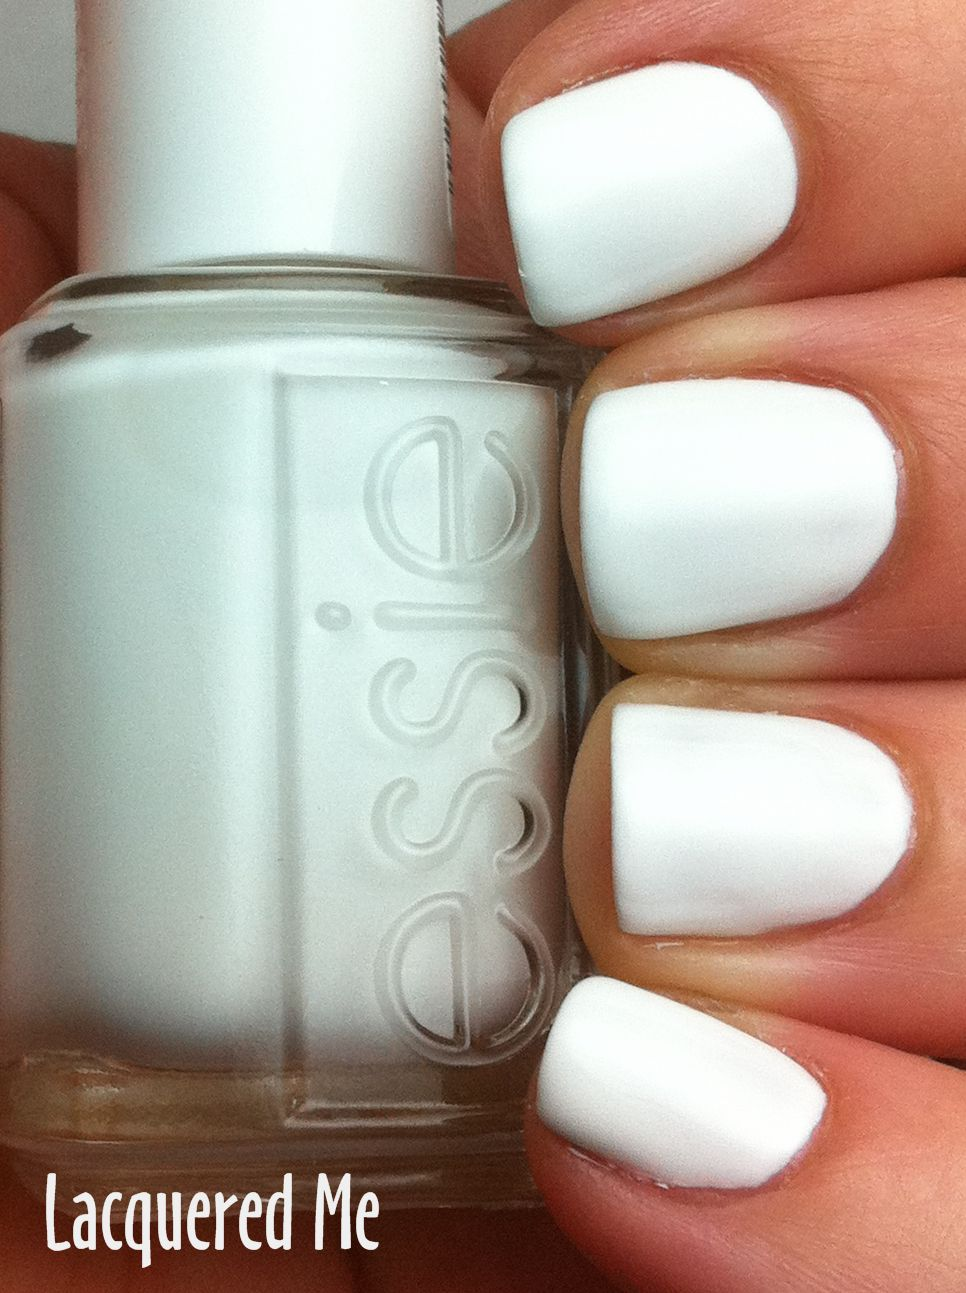 Essie Blanc : essie, blanc, Bright, White...Essie, Blanc, Perfect., Polish,, Essie, White, Nails